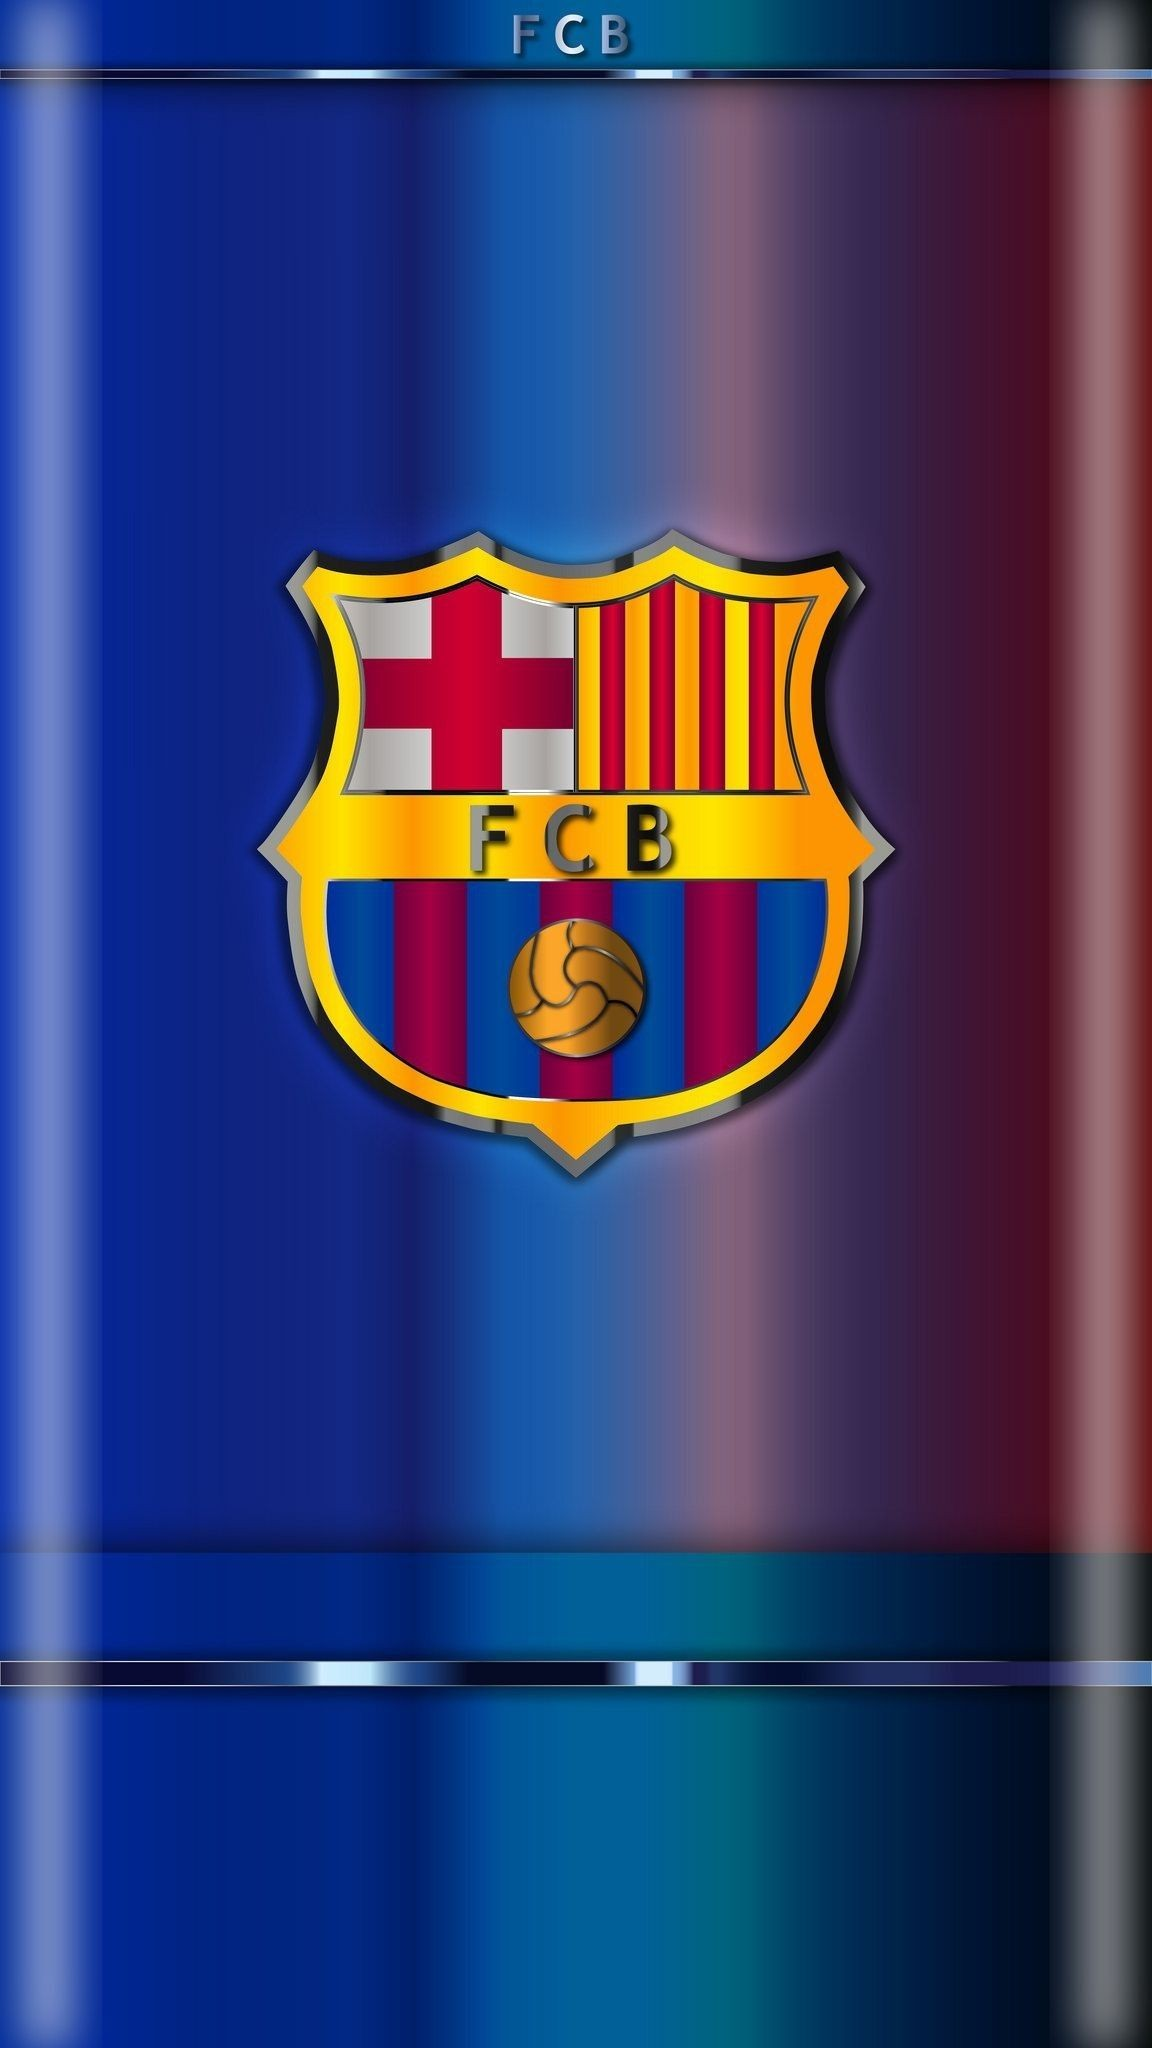 Pin de Gabriel Prendes Egger en FC Barcelona ❤ Pinterest